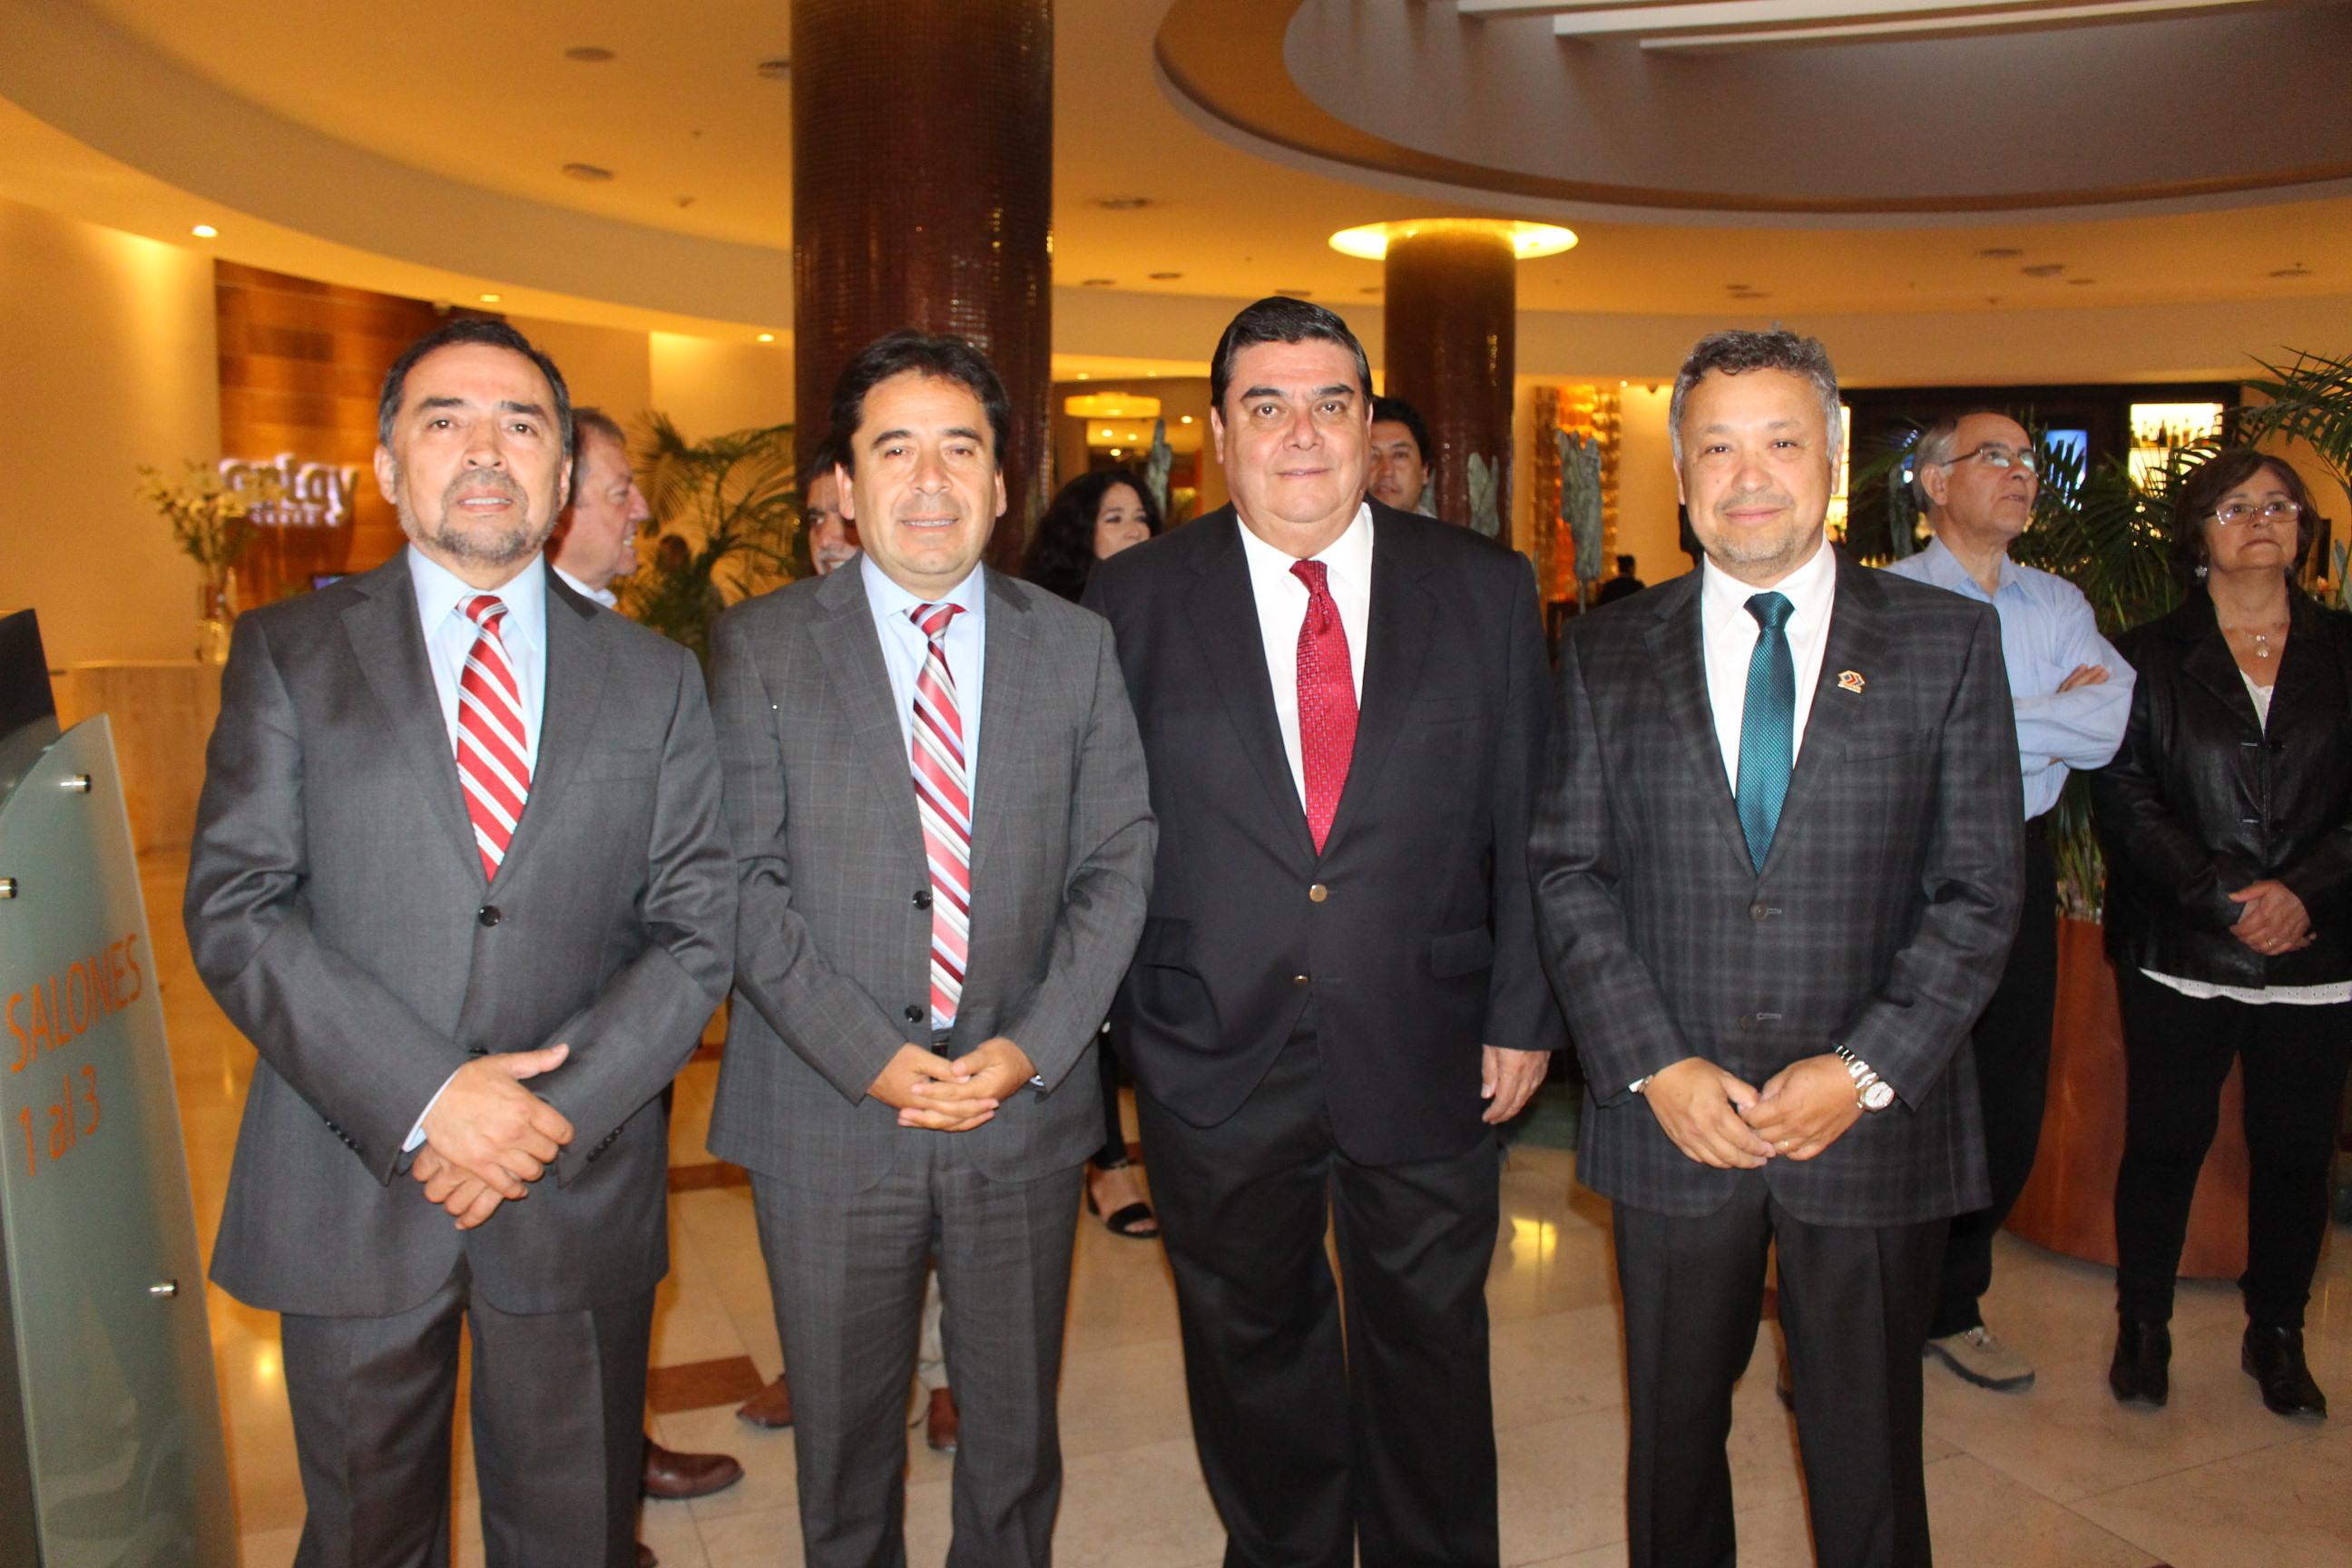 Corproa inaugura Forede con mensaje optimista y propositivo